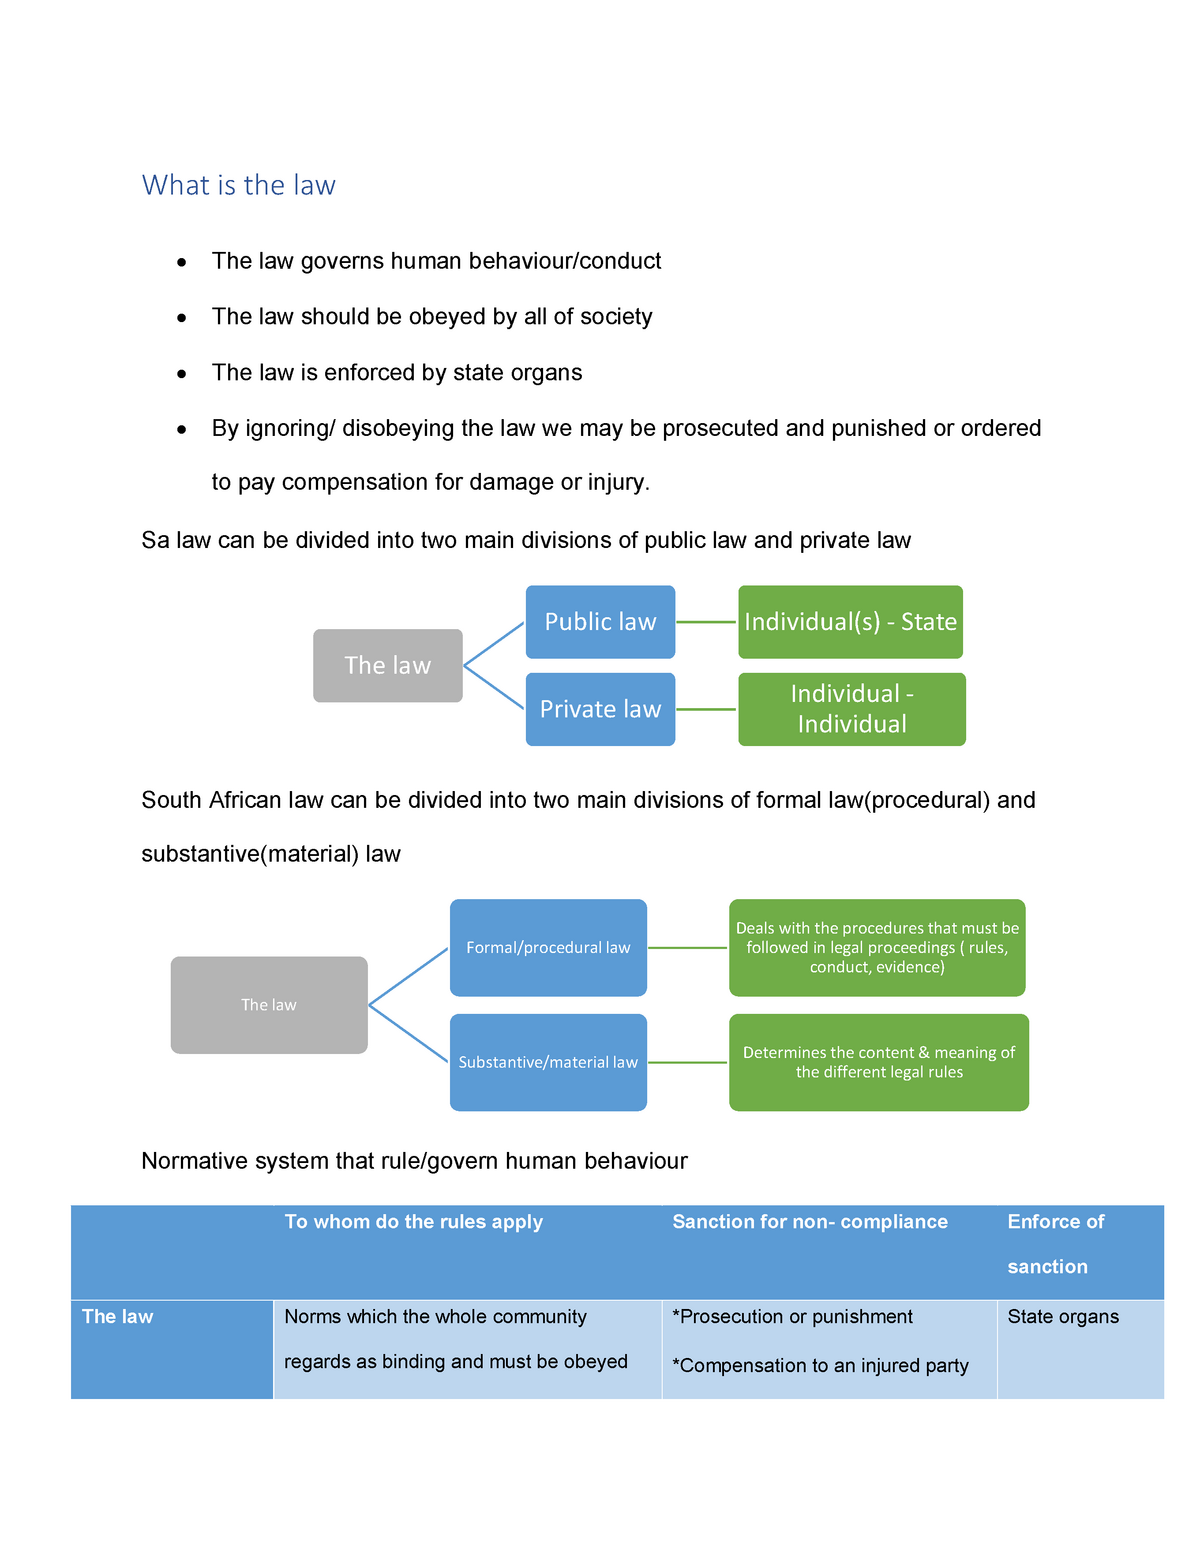 ILW1501 Study Notes - Introduction to Law - UNISA - StuDocu